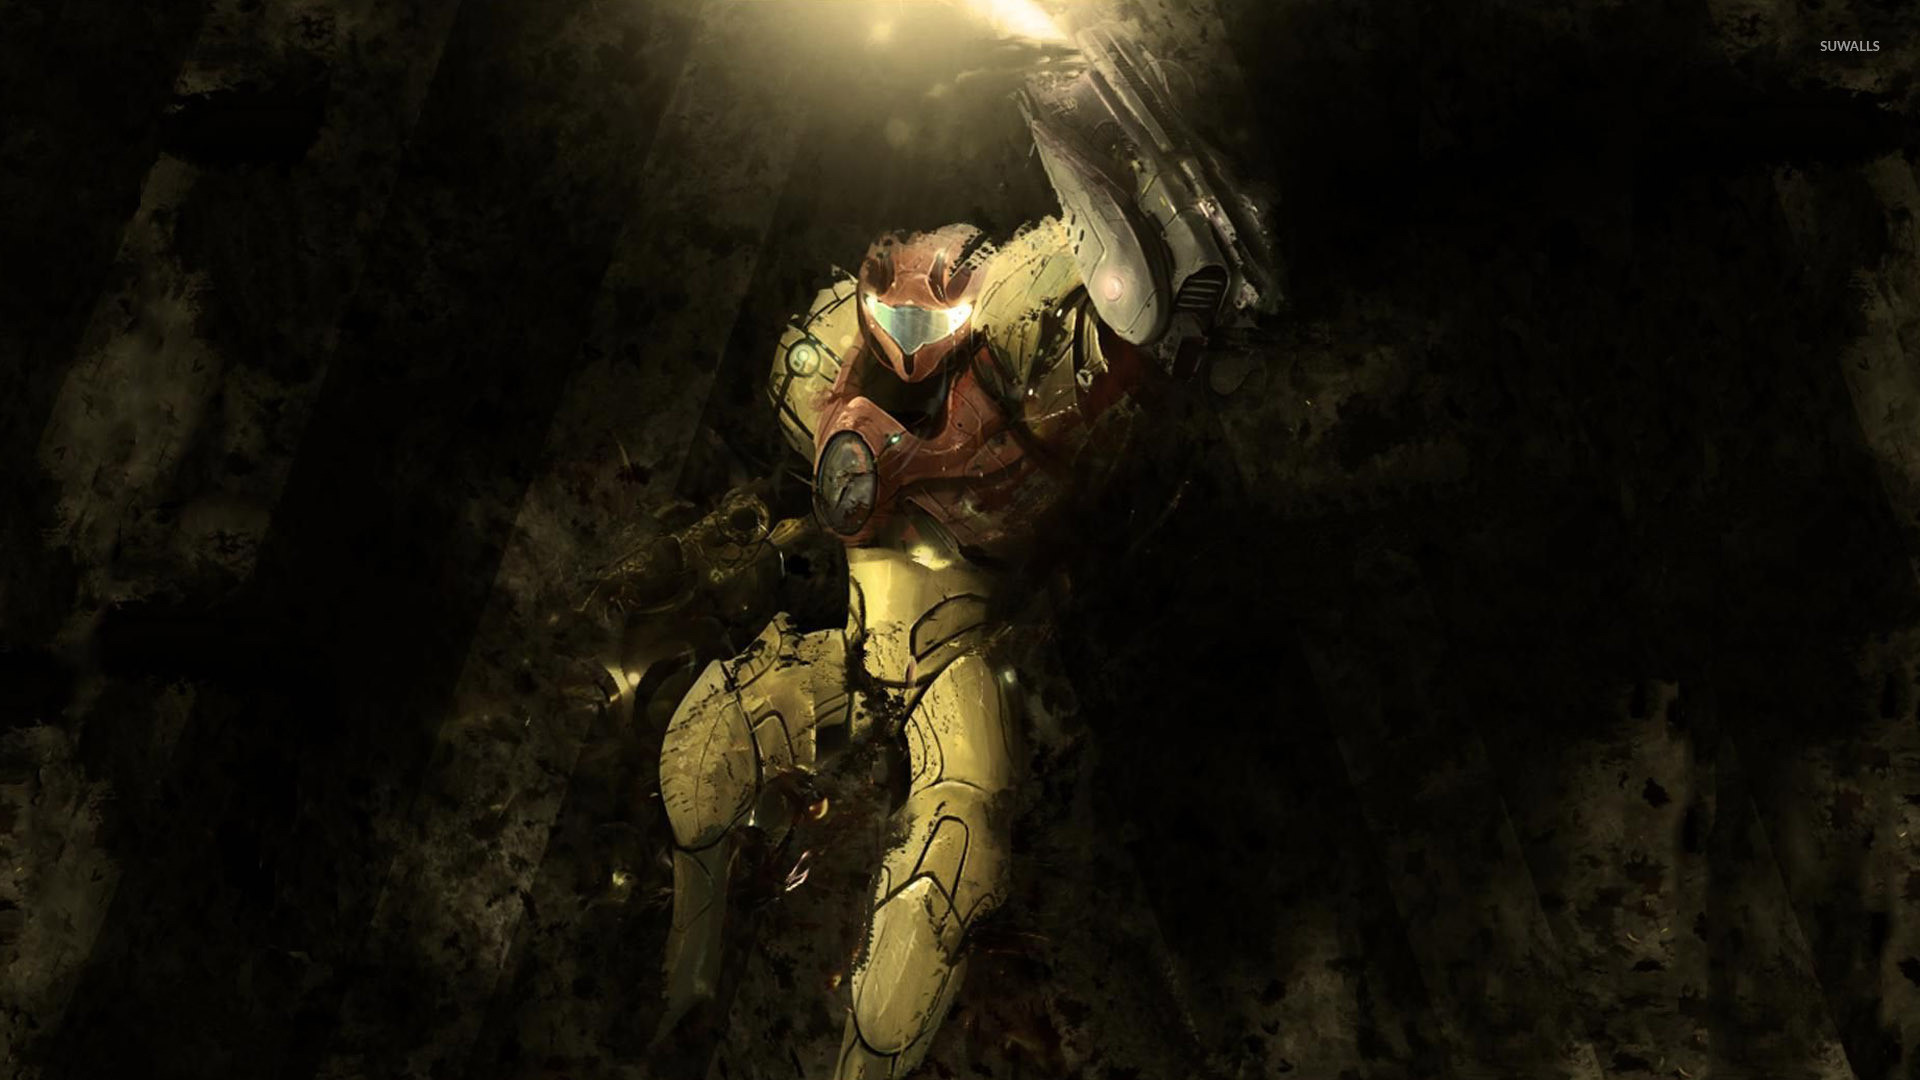 Samus Aran – Metroid [3] wallpaper jpg